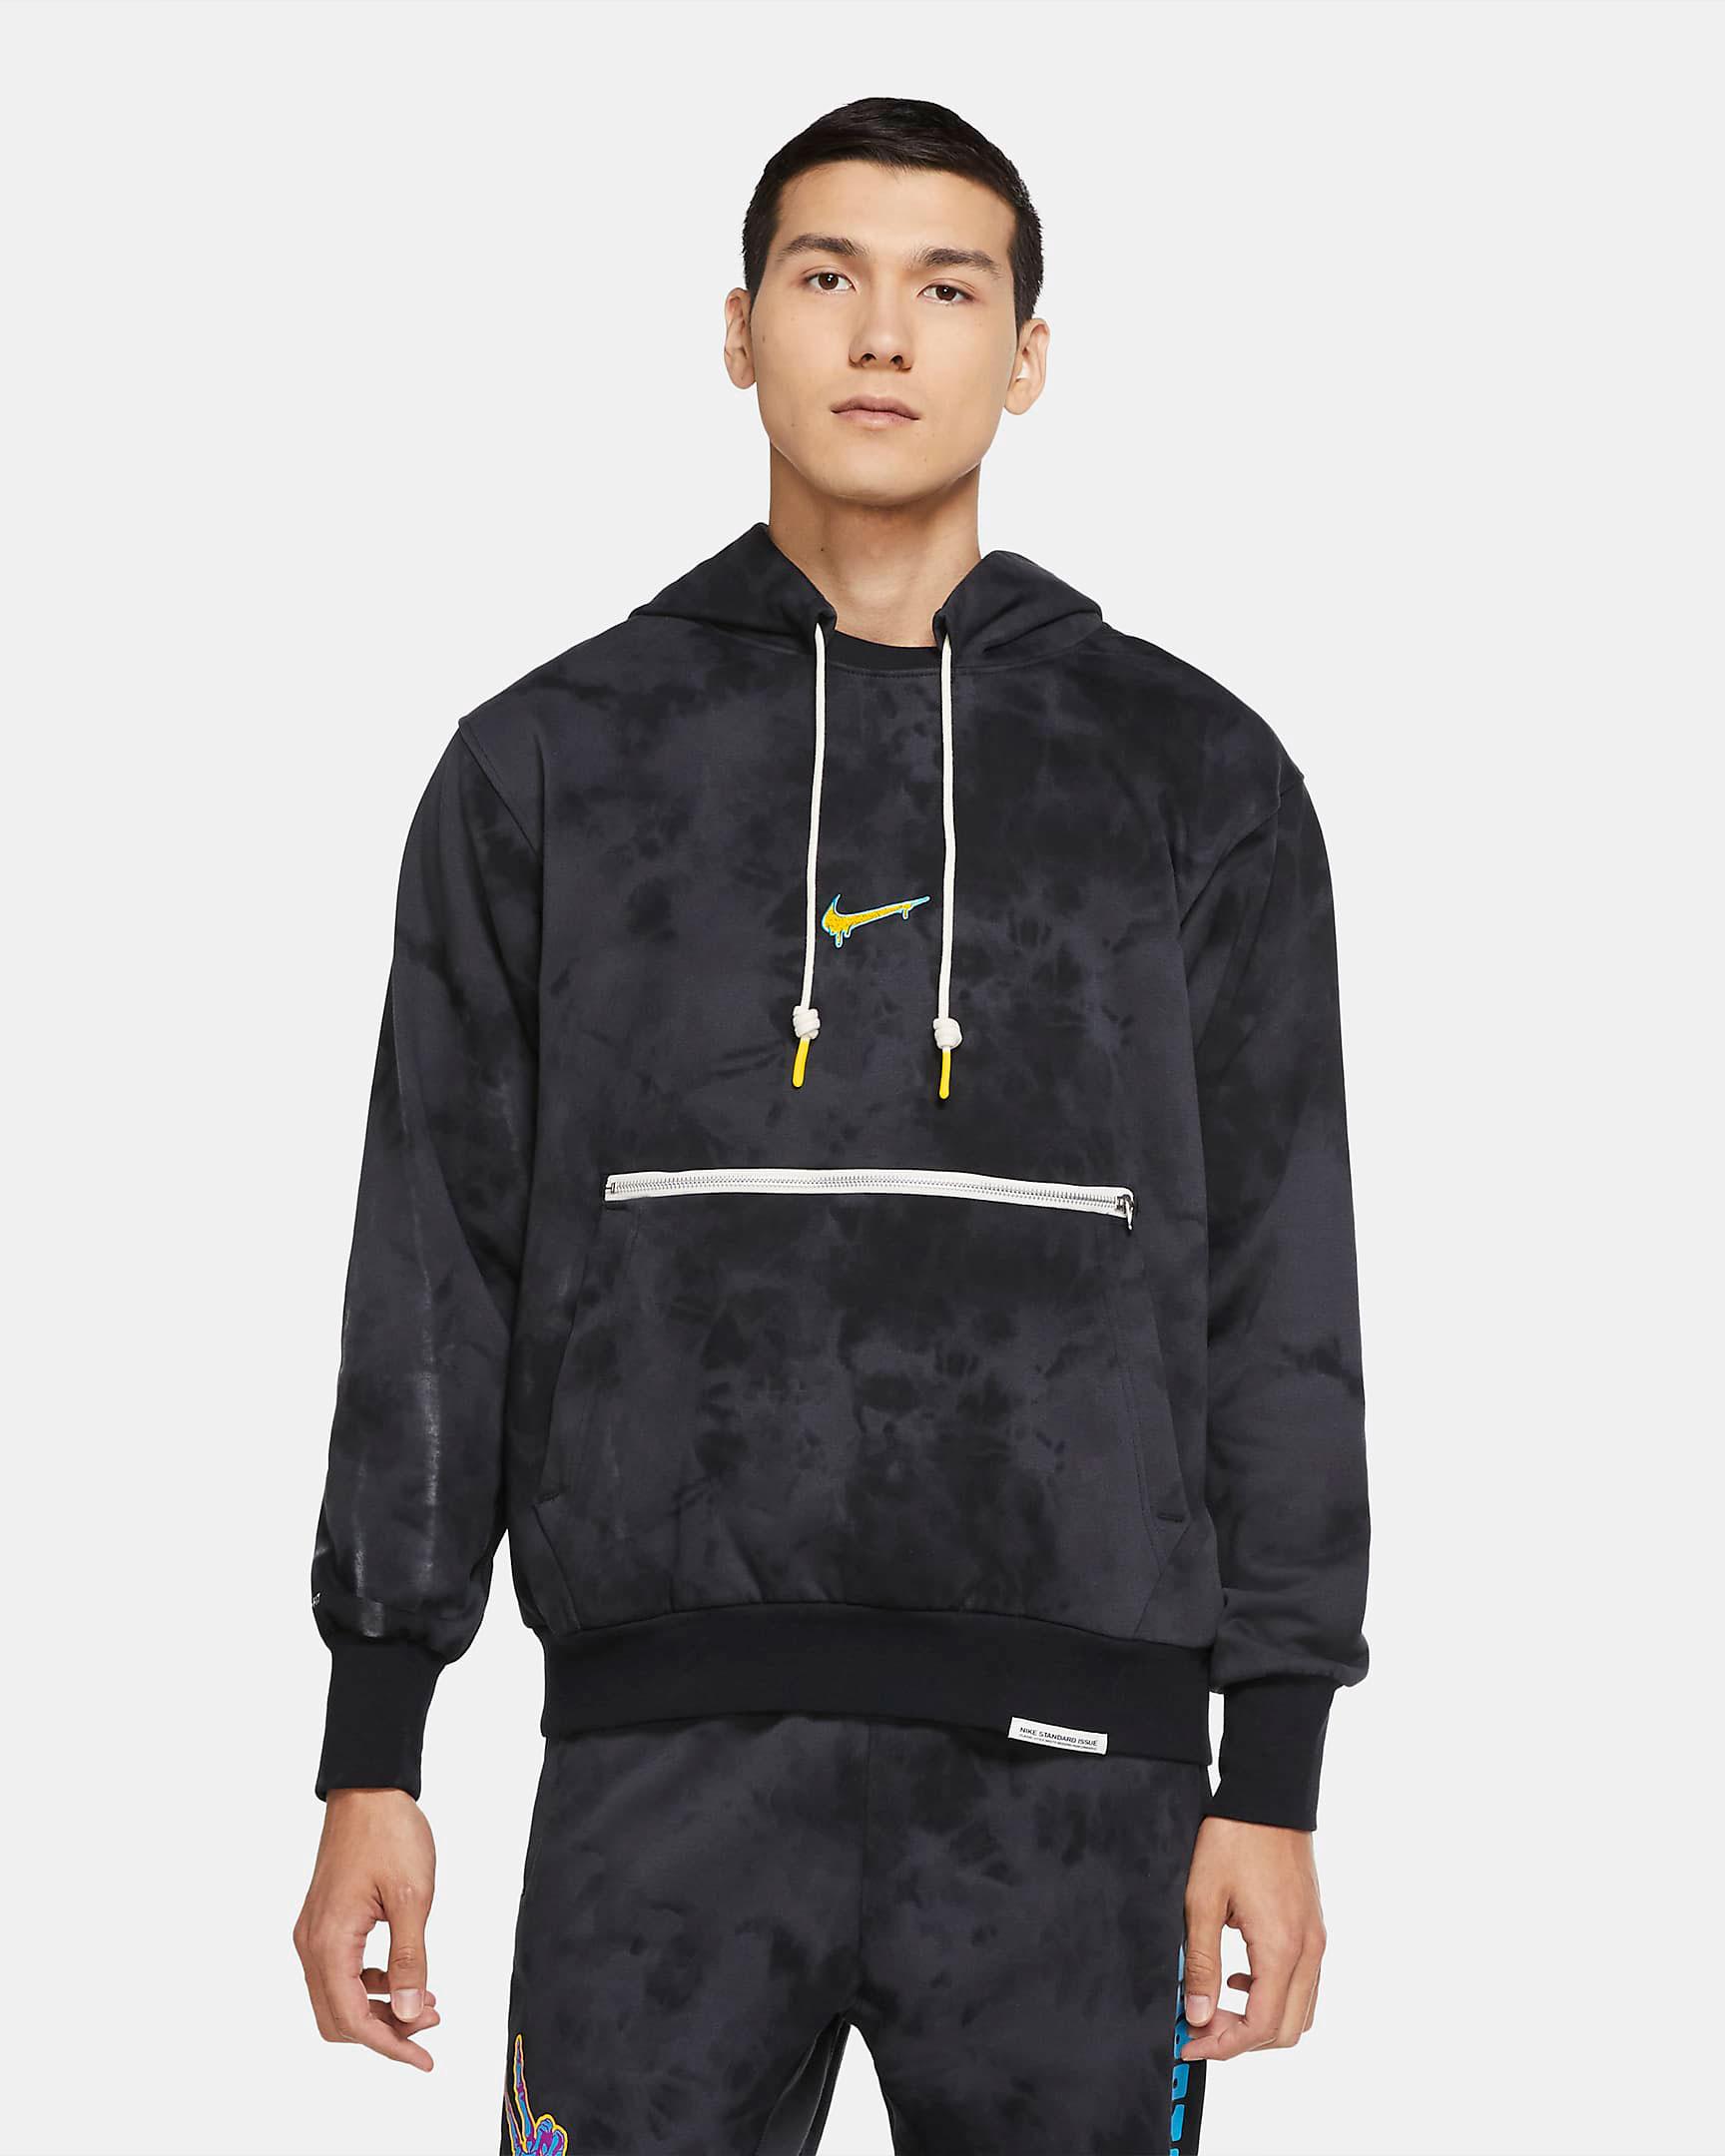 nike-peace-love-basketball-hoodie-black-1